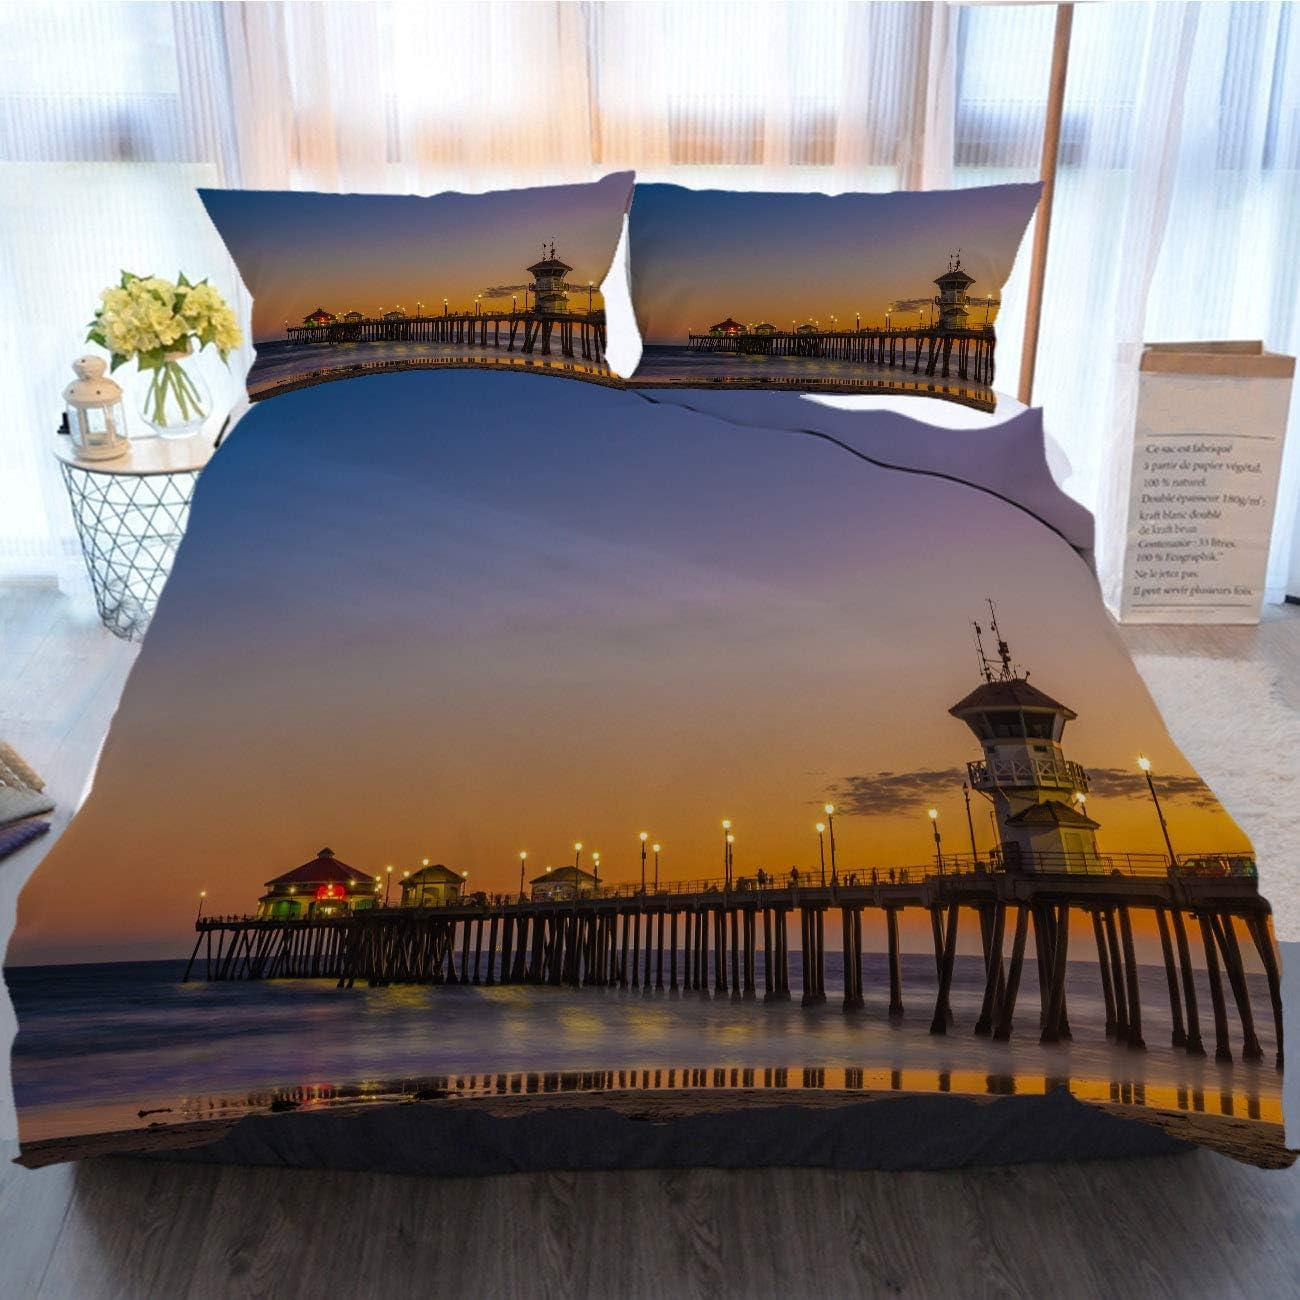 Sunset Bedding 3 Piece Duvet Cover Sets,Sunset Dusk Shots of The Pier at Huntington Beach,Home Luxury Soft Duvet Comforter Cover,Twin